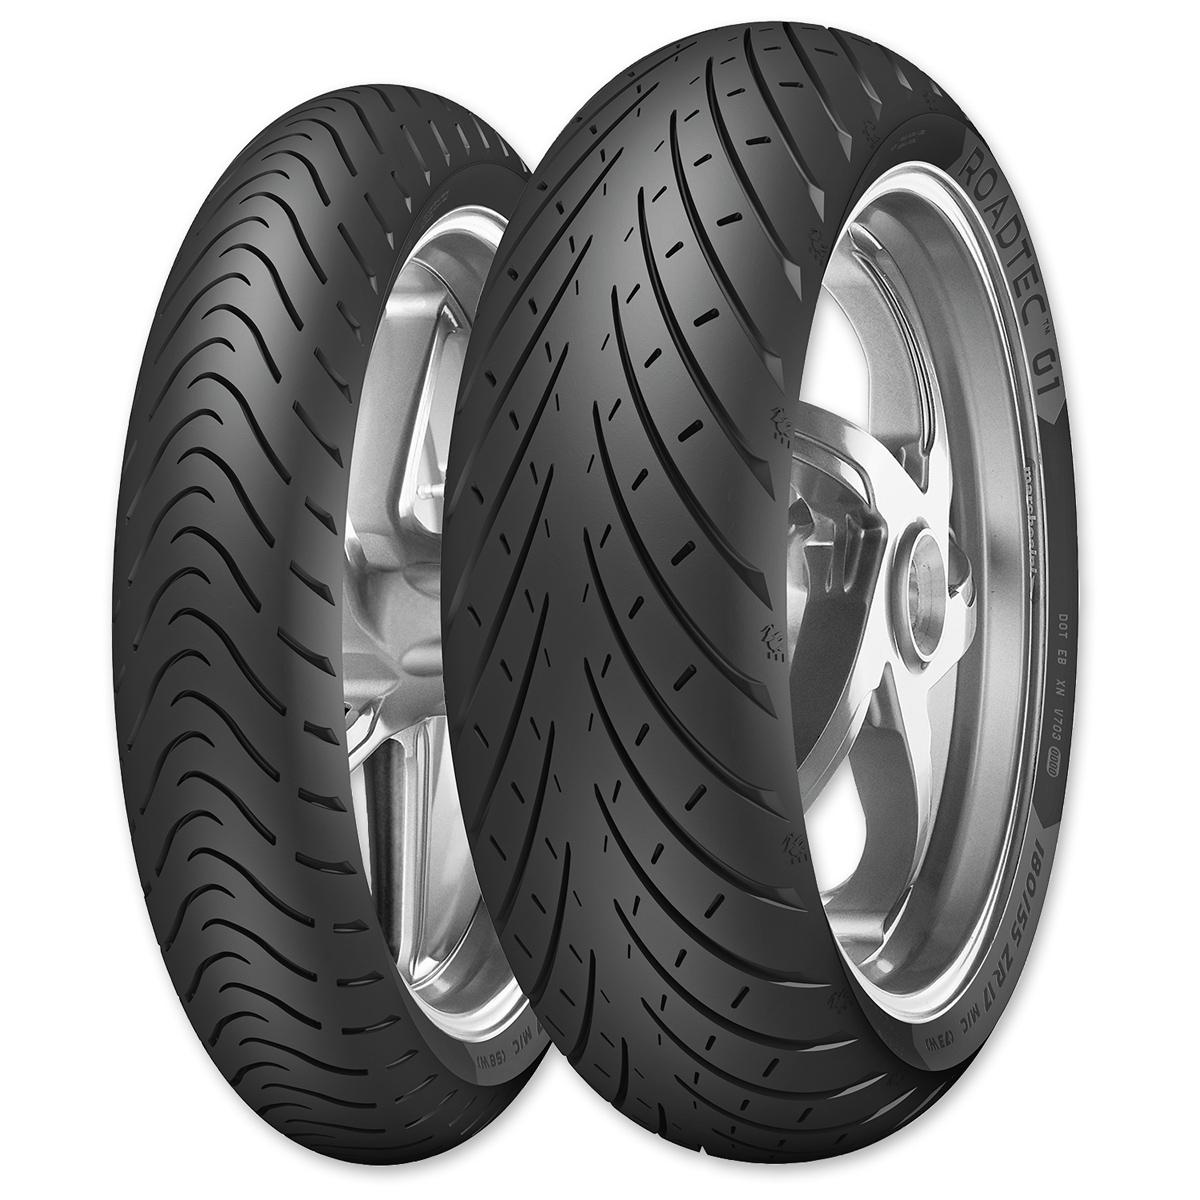 Metzeler Roadtec 01 190/50ZR17 Rear Tire HWM